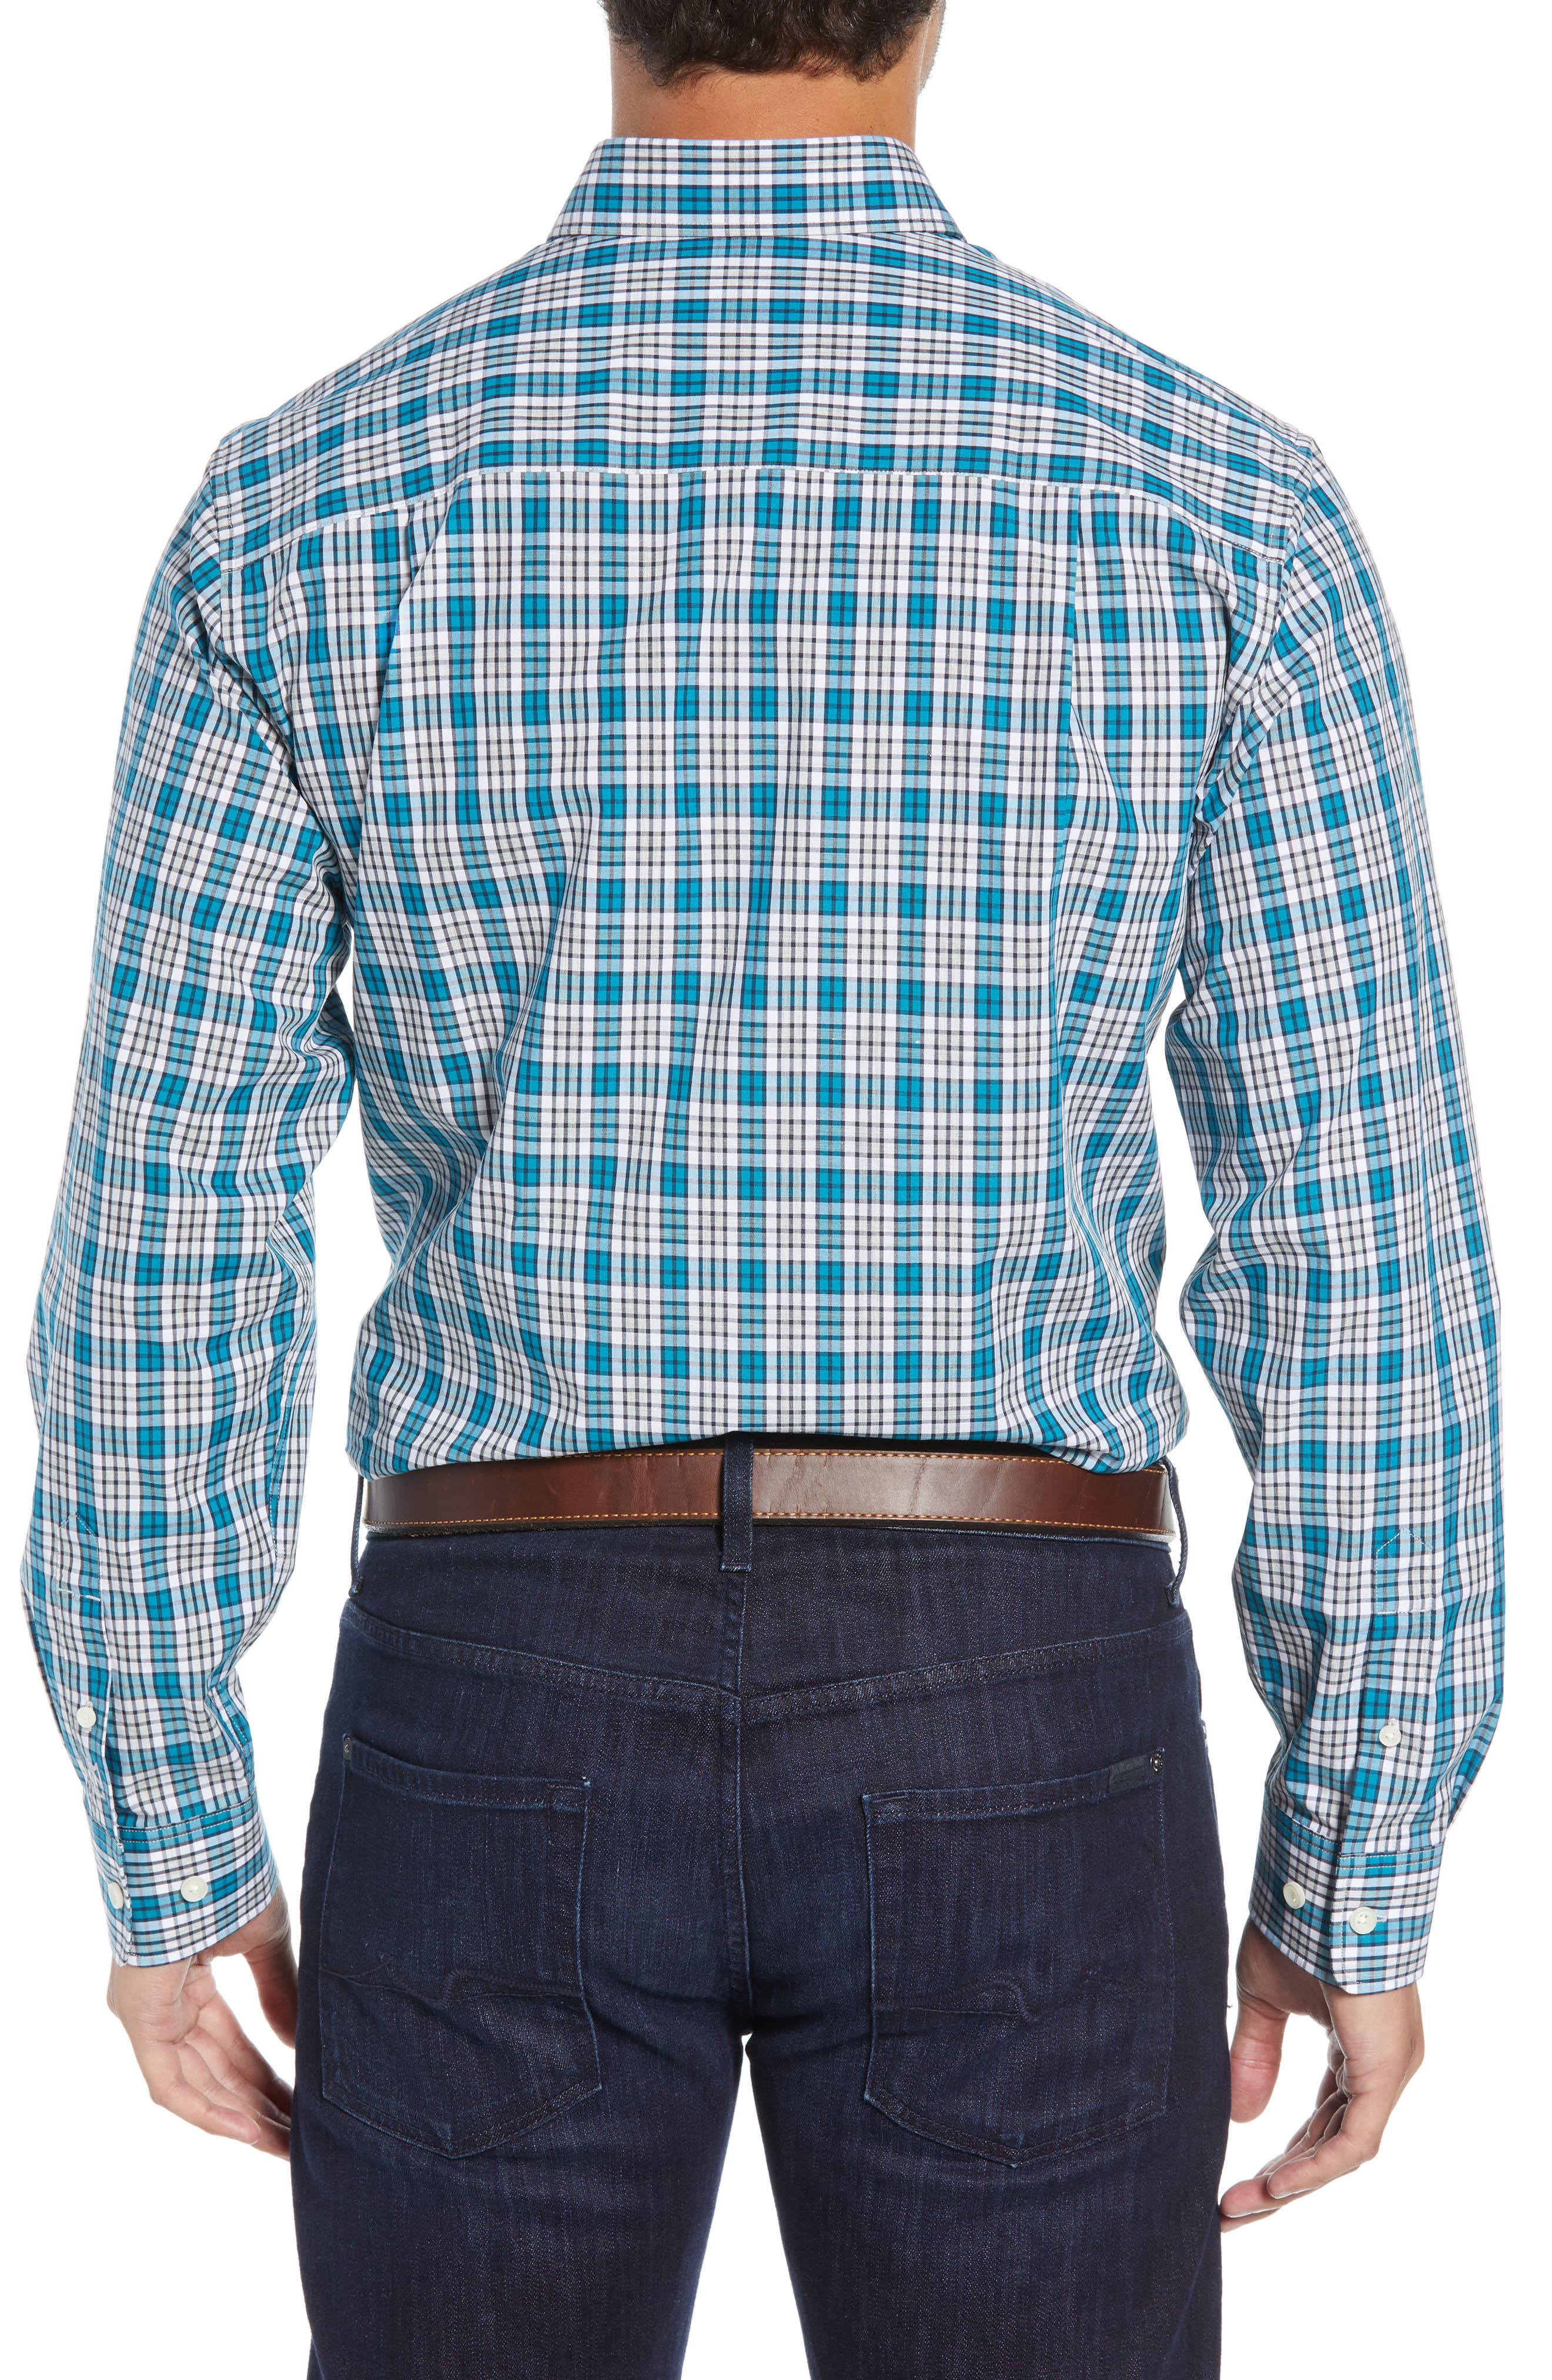 Harris Regular Fit Non-Iron Plaid Sport Shirt,                             Alternate thumbnail 3, color,                             AQUATIC